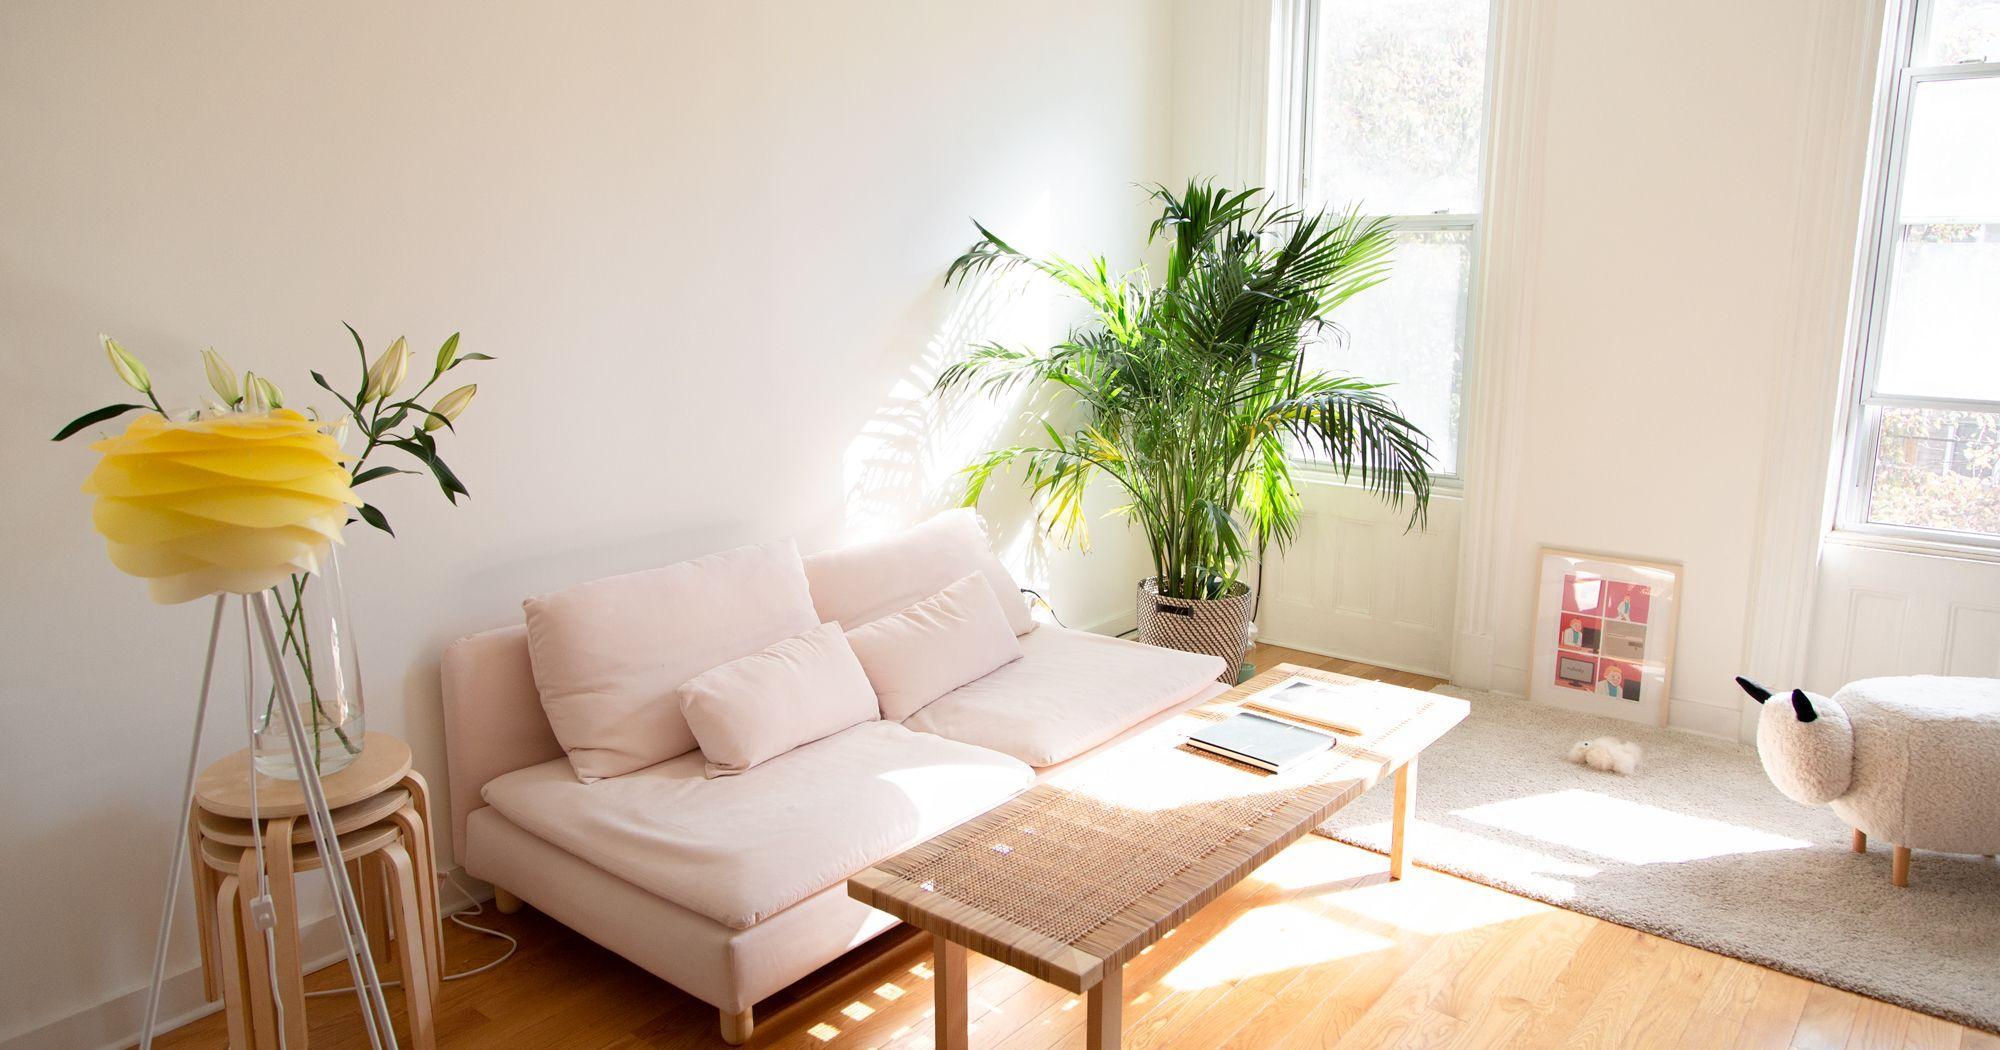 My 1 Bedroom In Brooklyn Costs 2 700 Here S How Big It Is One Bedroom Apartment 1 Bedroom Flat One Bedroom